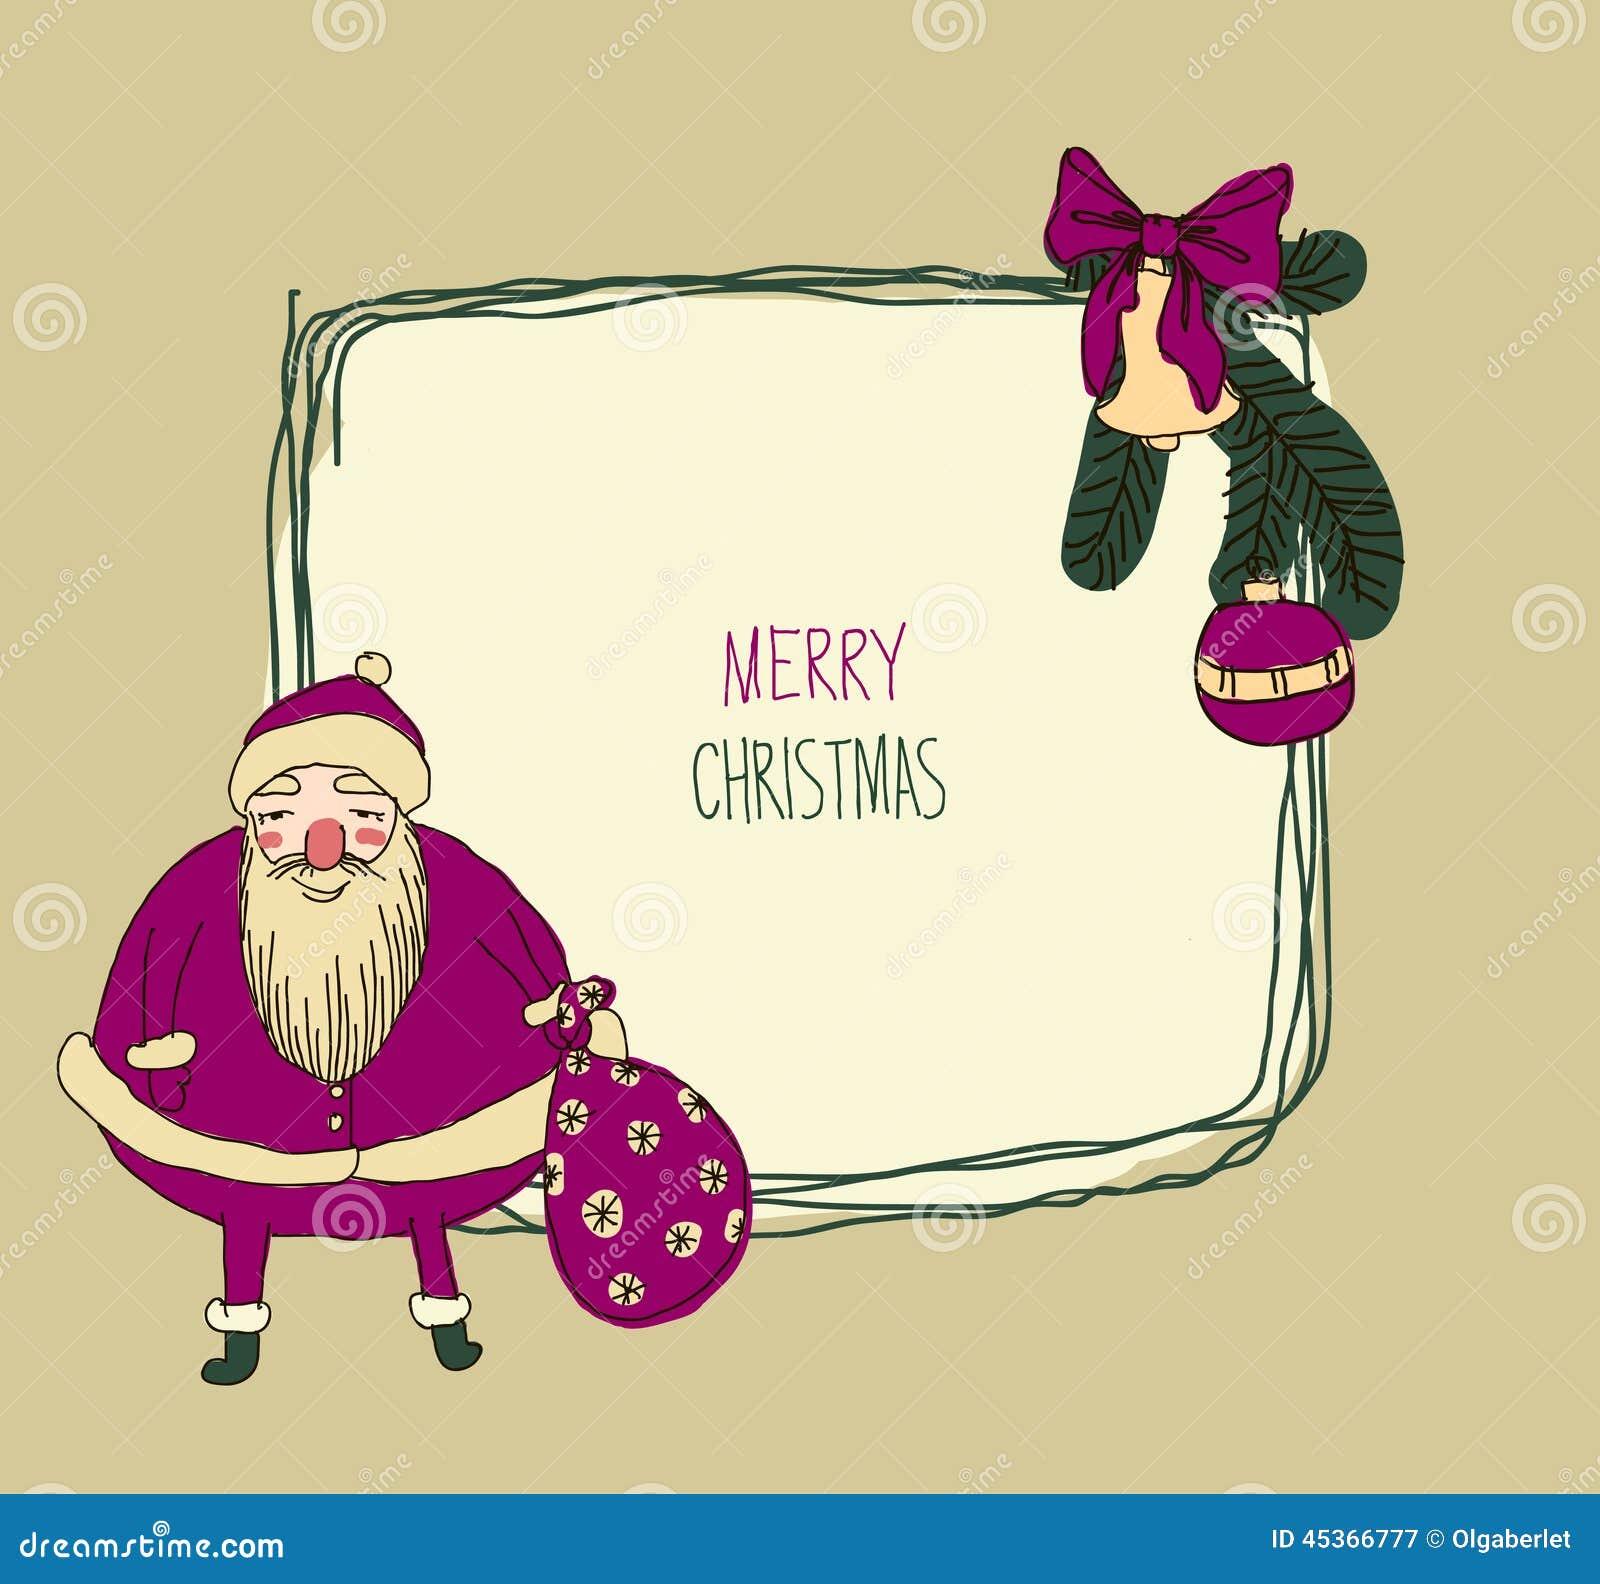 Signe en métal de vintage - Joyeux Noël